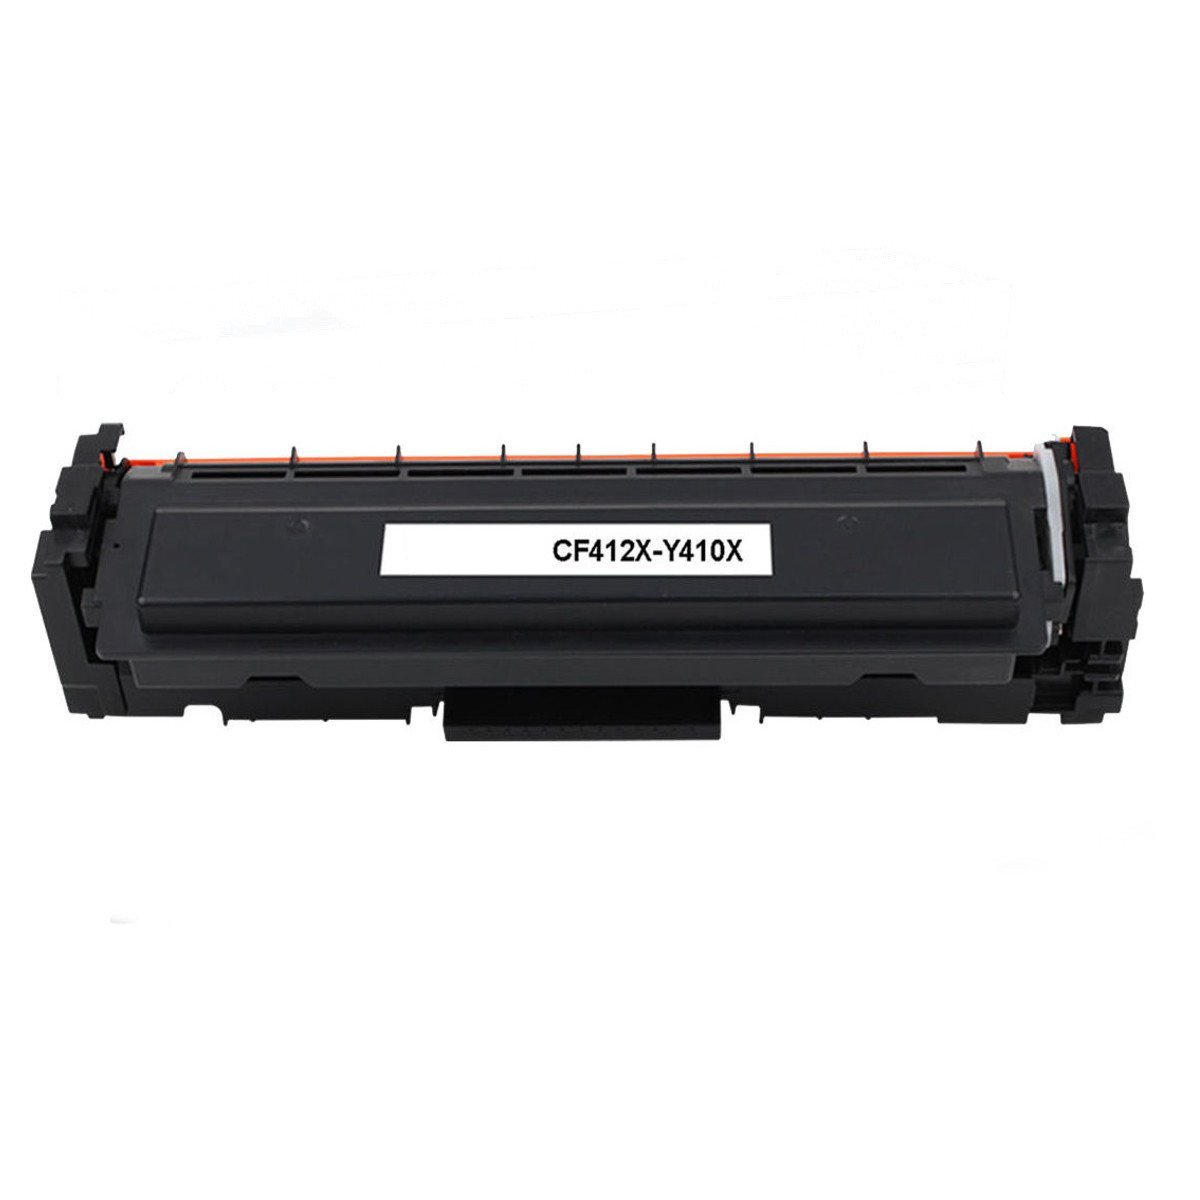 Compatible HP 410X CF412X Yellow Toner Cartridge High Yield- Economical Box